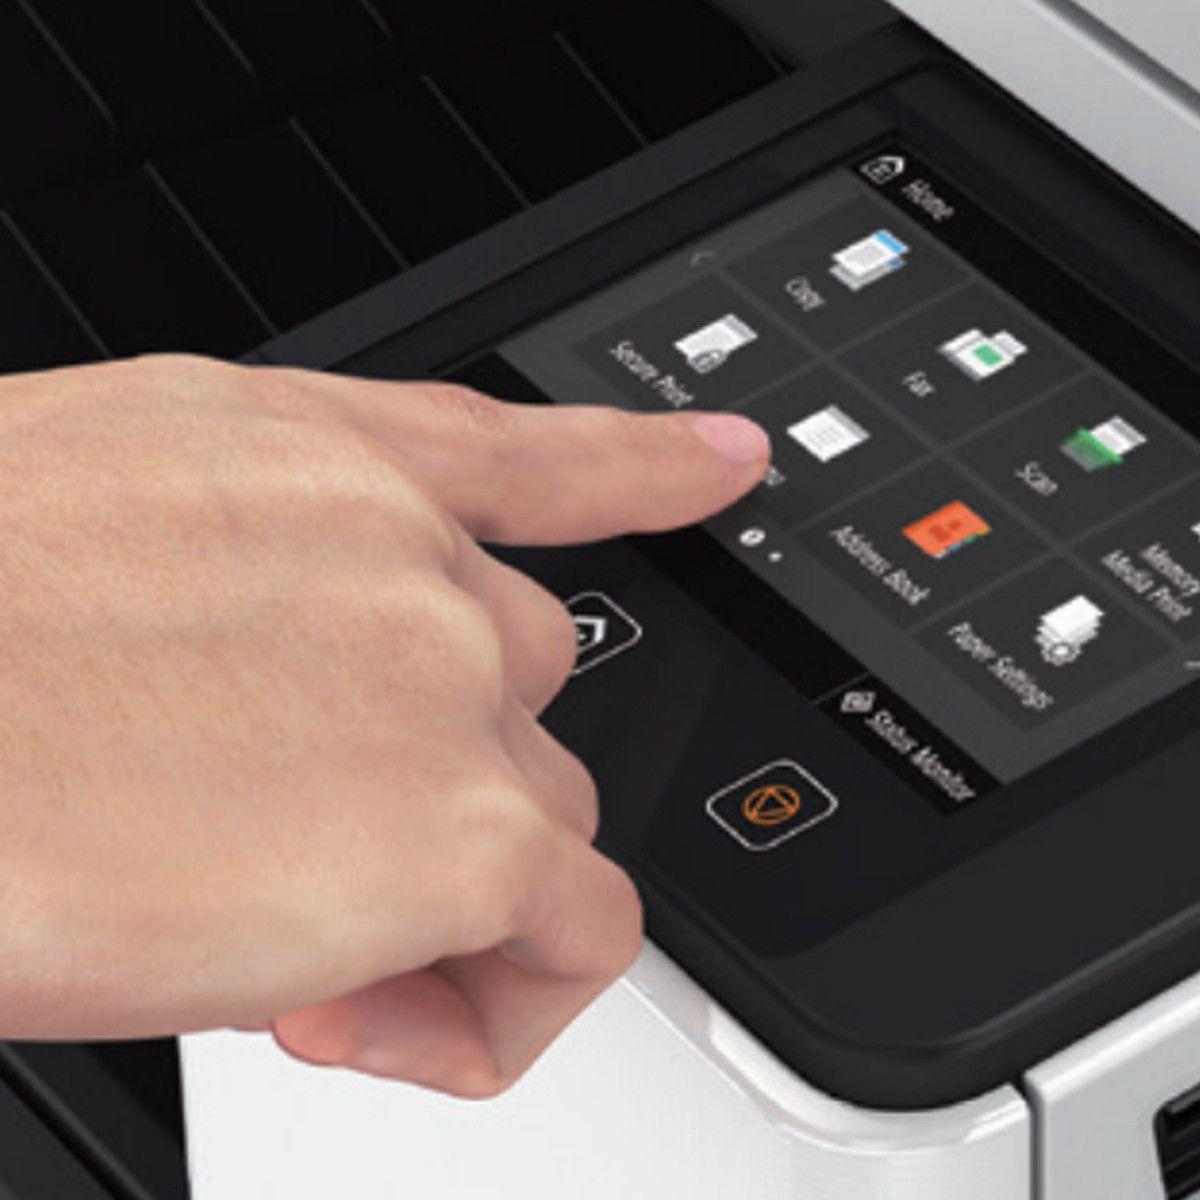 Impressora Canon Multifuncional WG7140